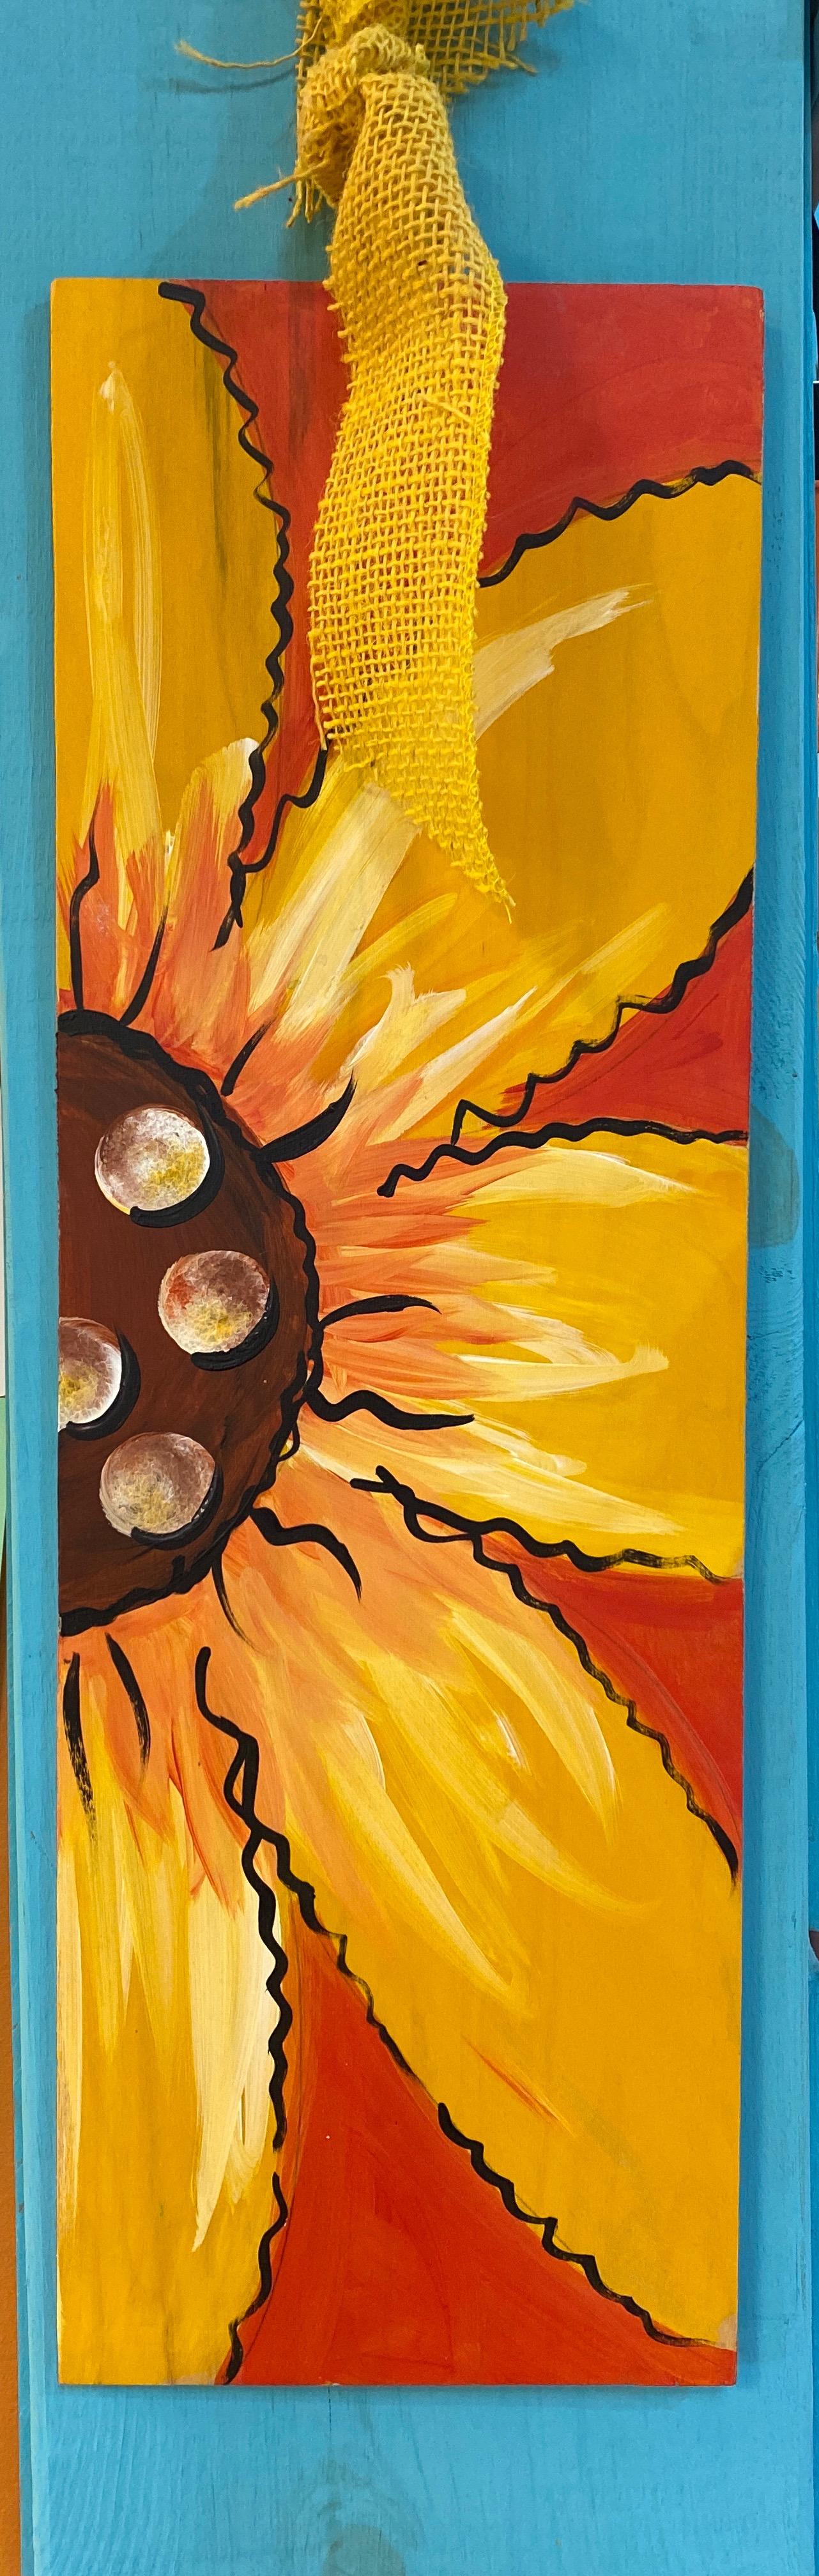 Sunflower Board 3